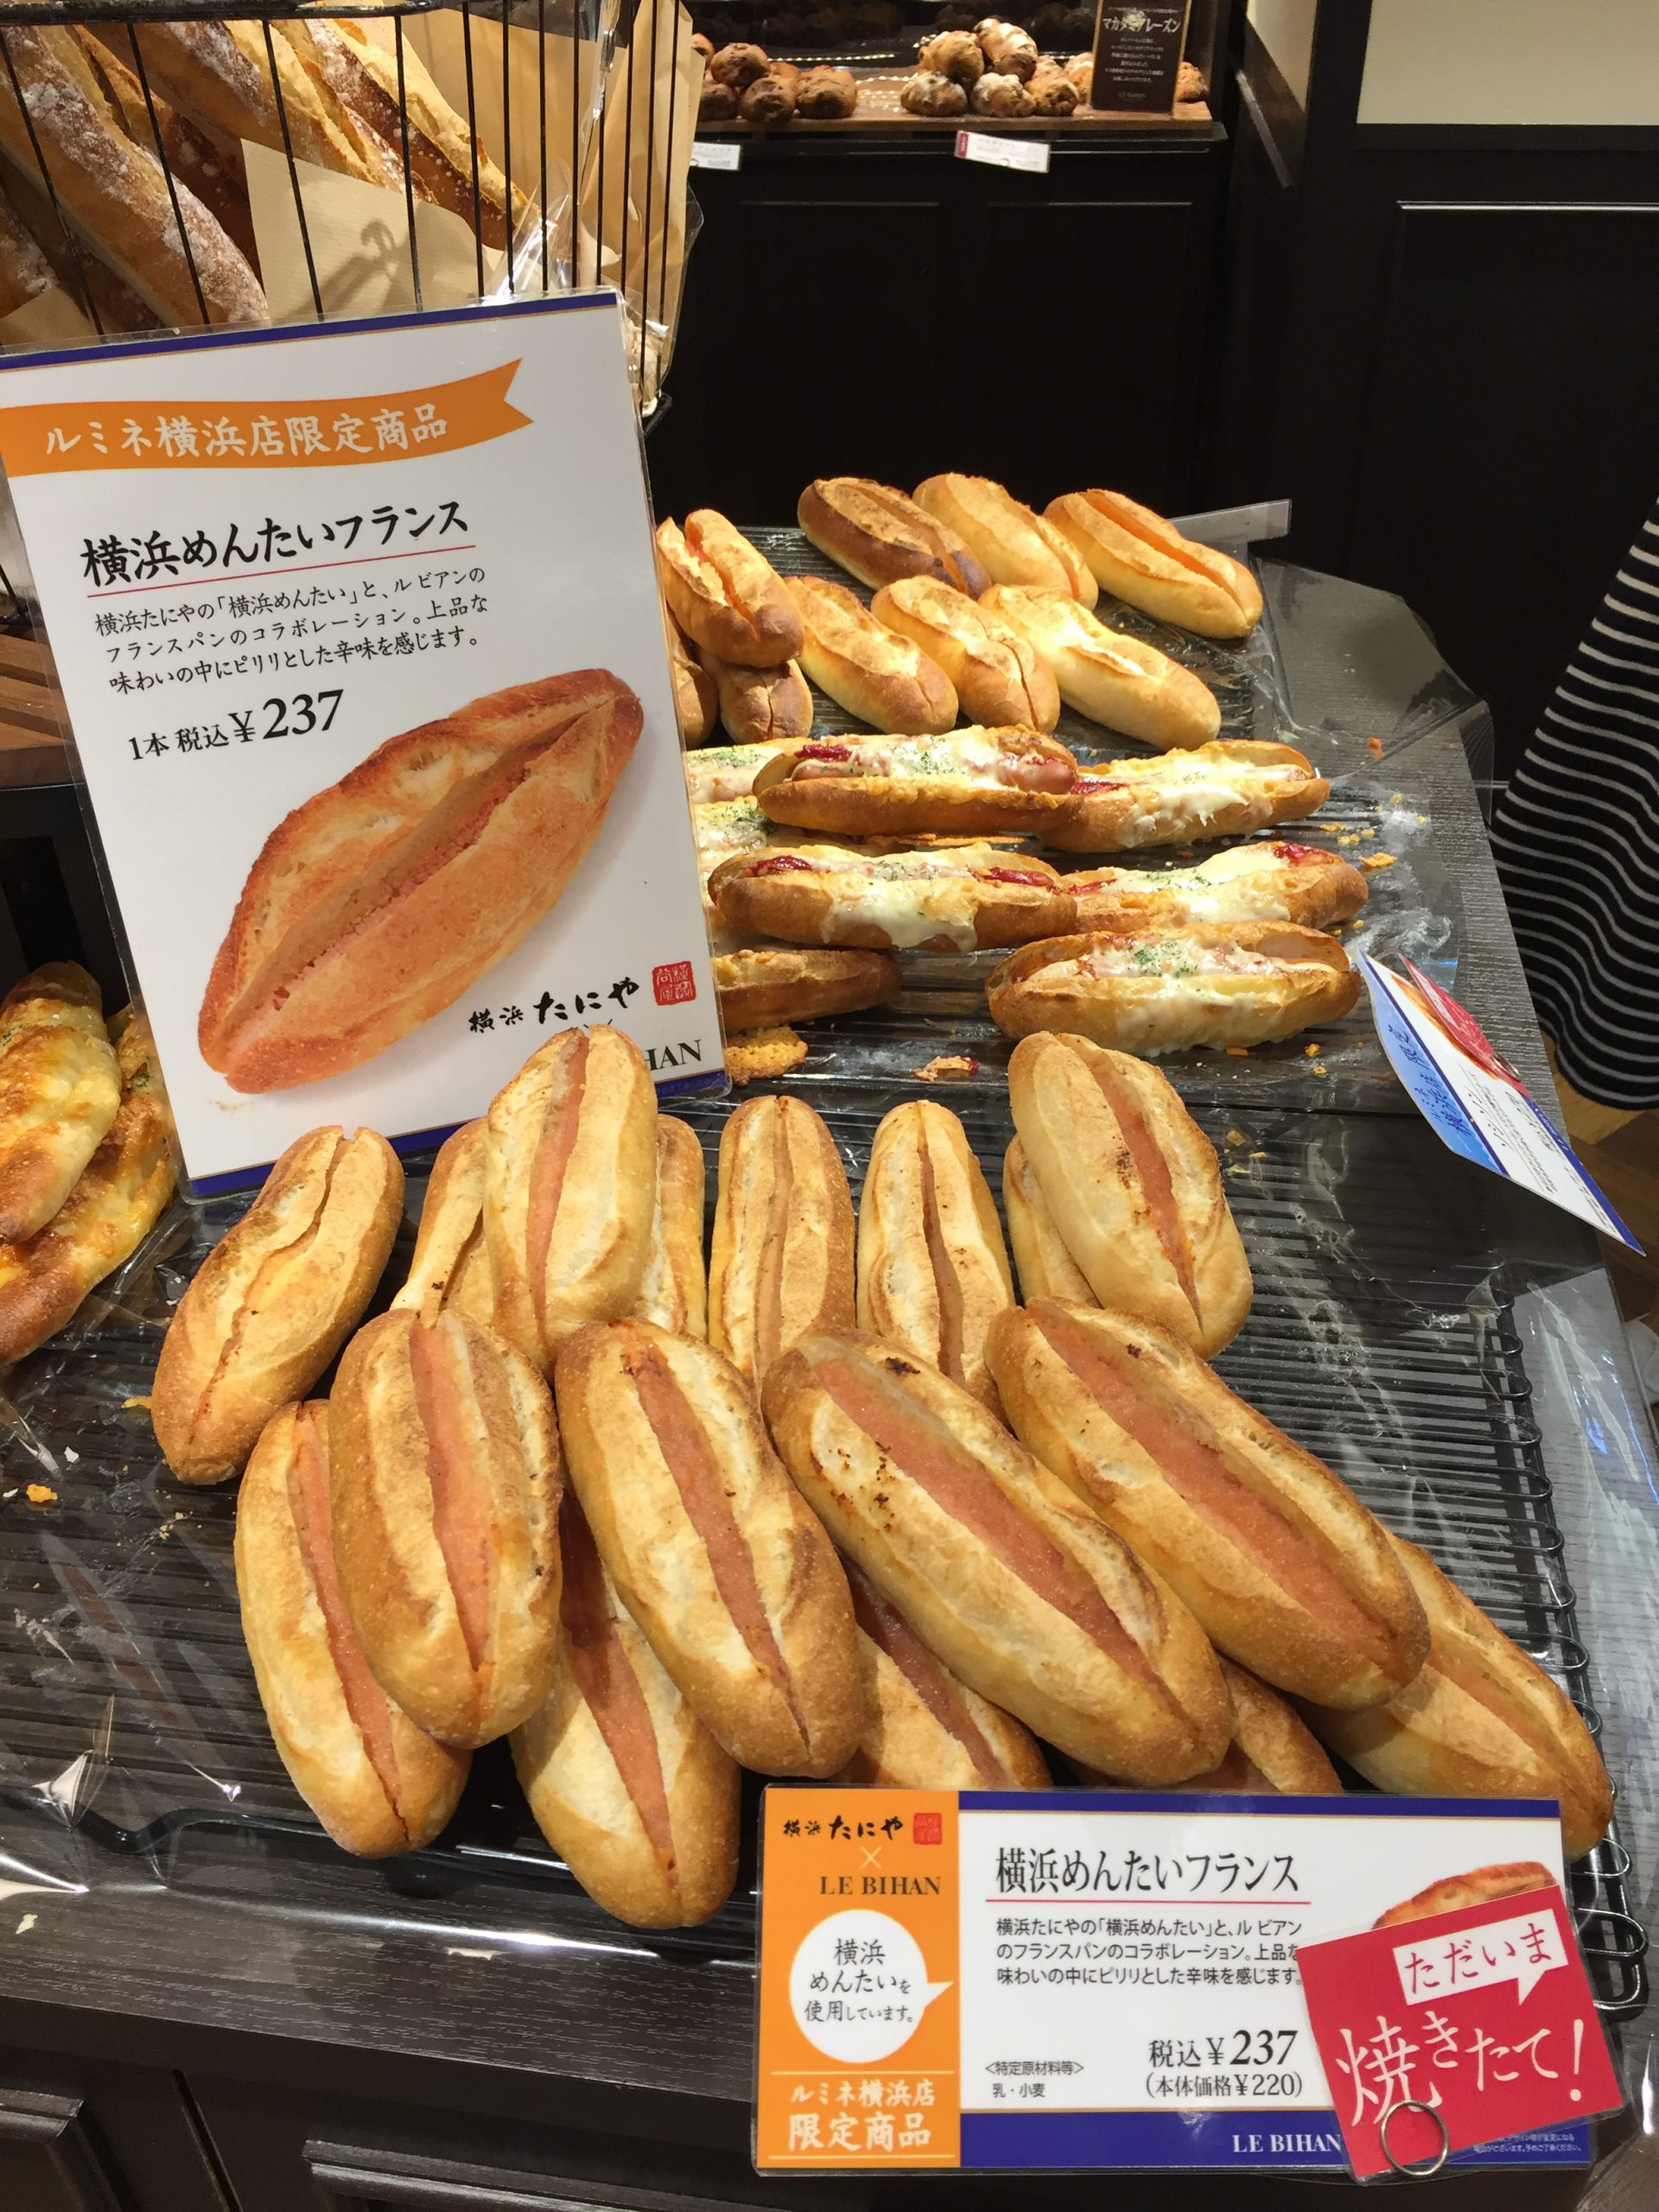 https://shop.gyorankobo.jp/wp-content/uploads/2020/03/HP画像_ルビアン(めんたいフランス)-scaled.jpg